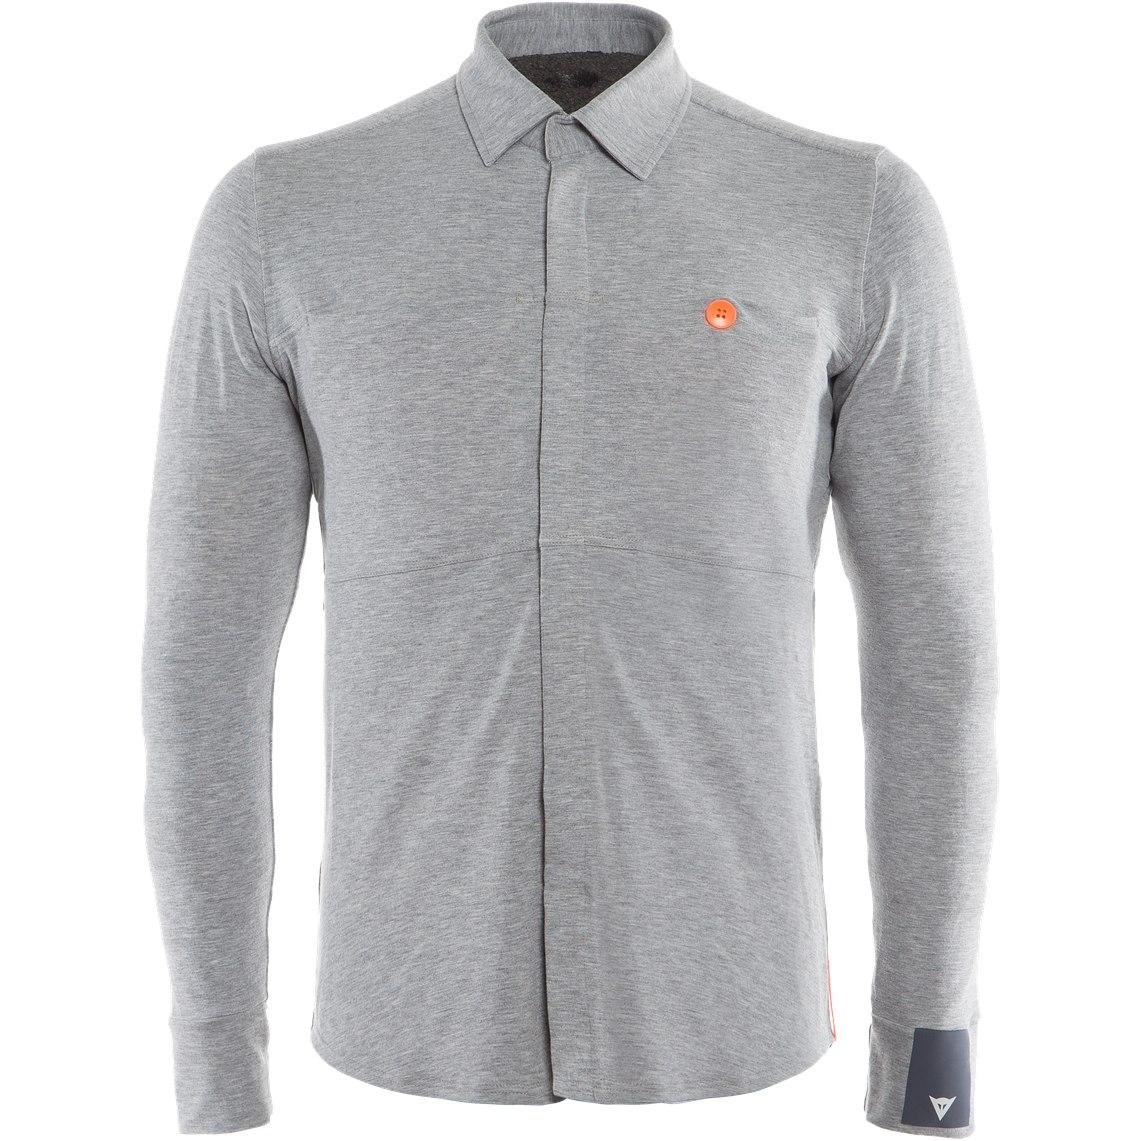 Dainese AWA Black Shirt - drizzle